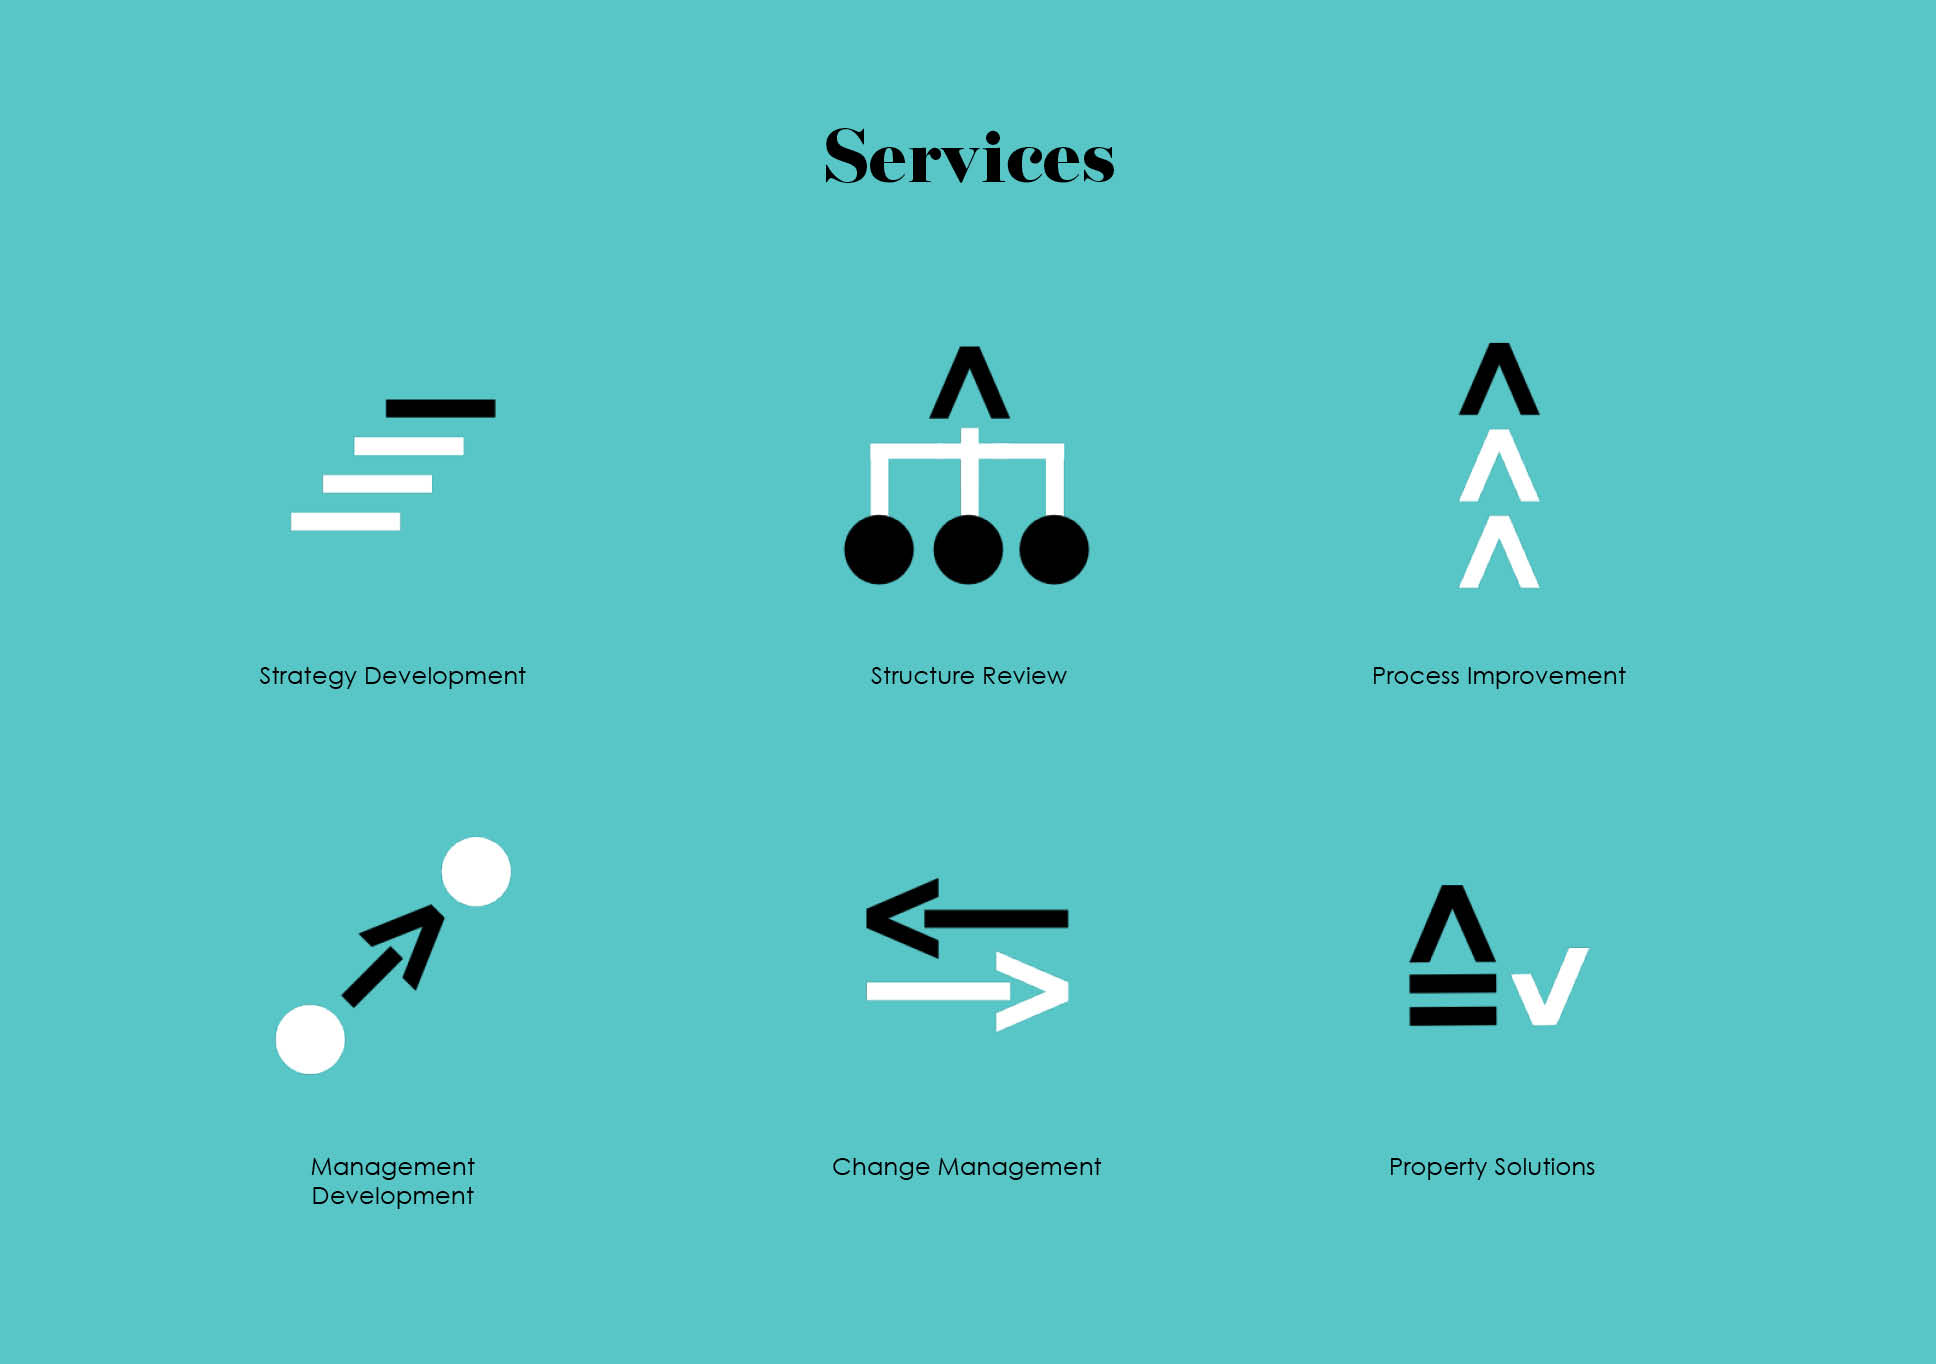 Alan Wilcox service icons